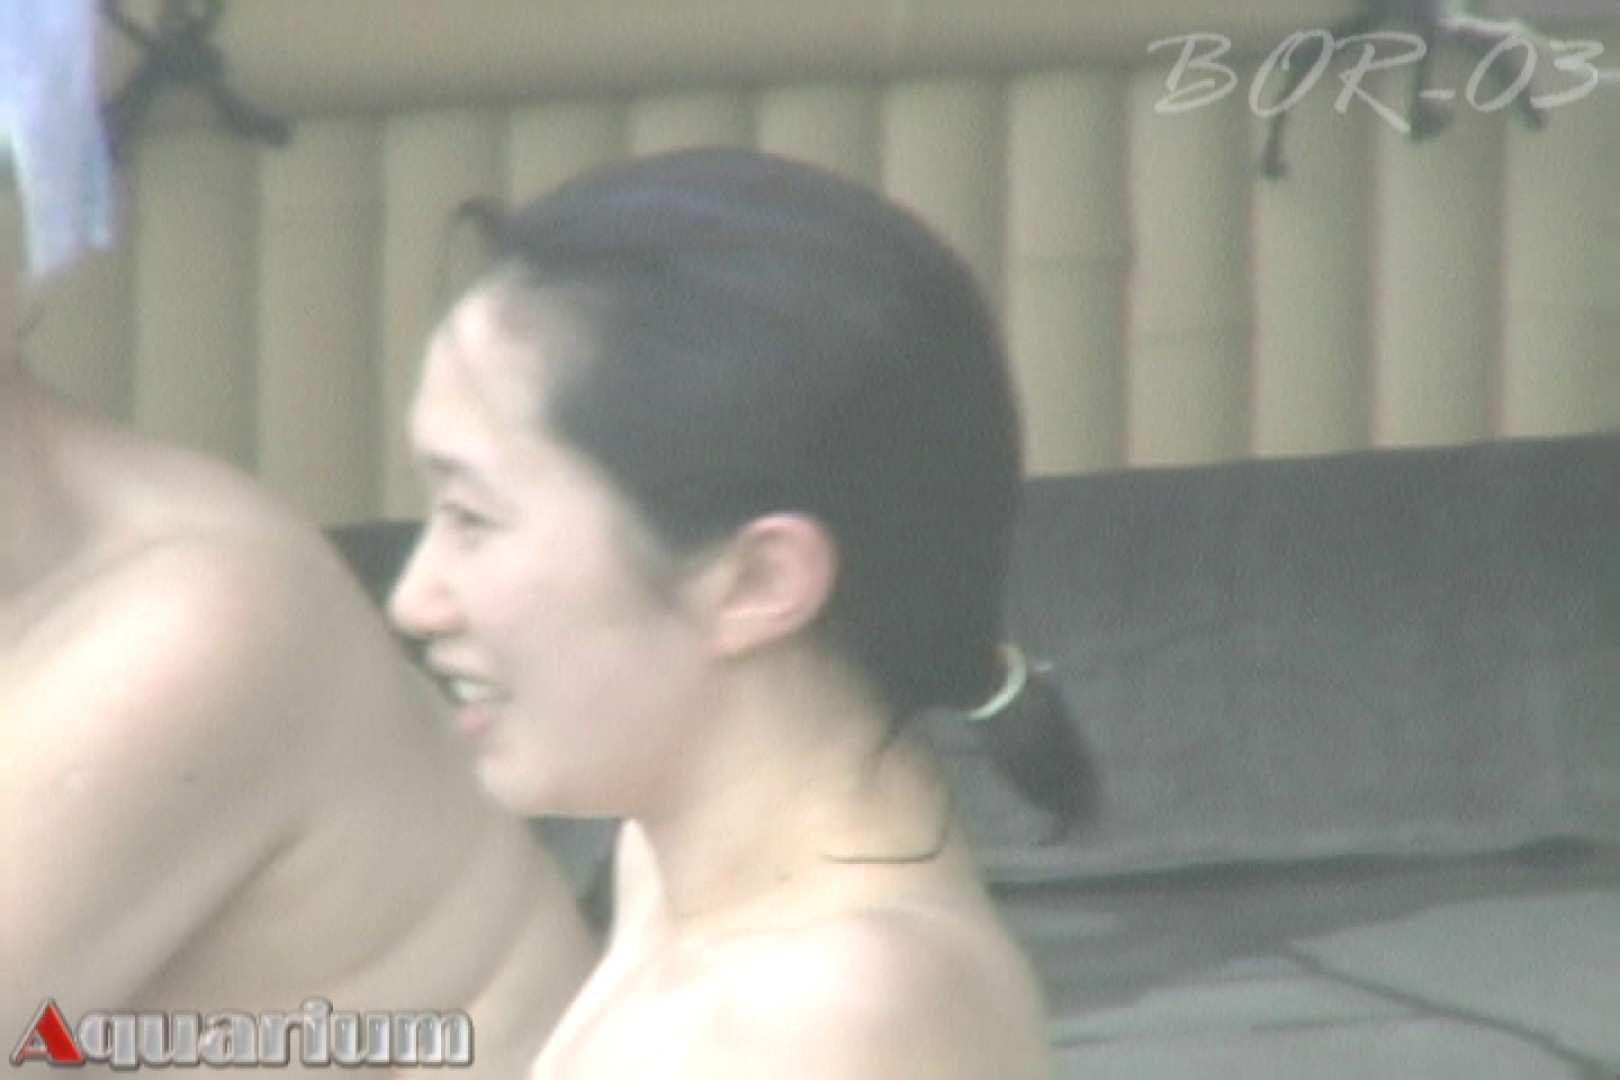 Aquaな露天風呂Vol.486 盗撮師作品  69pic 39